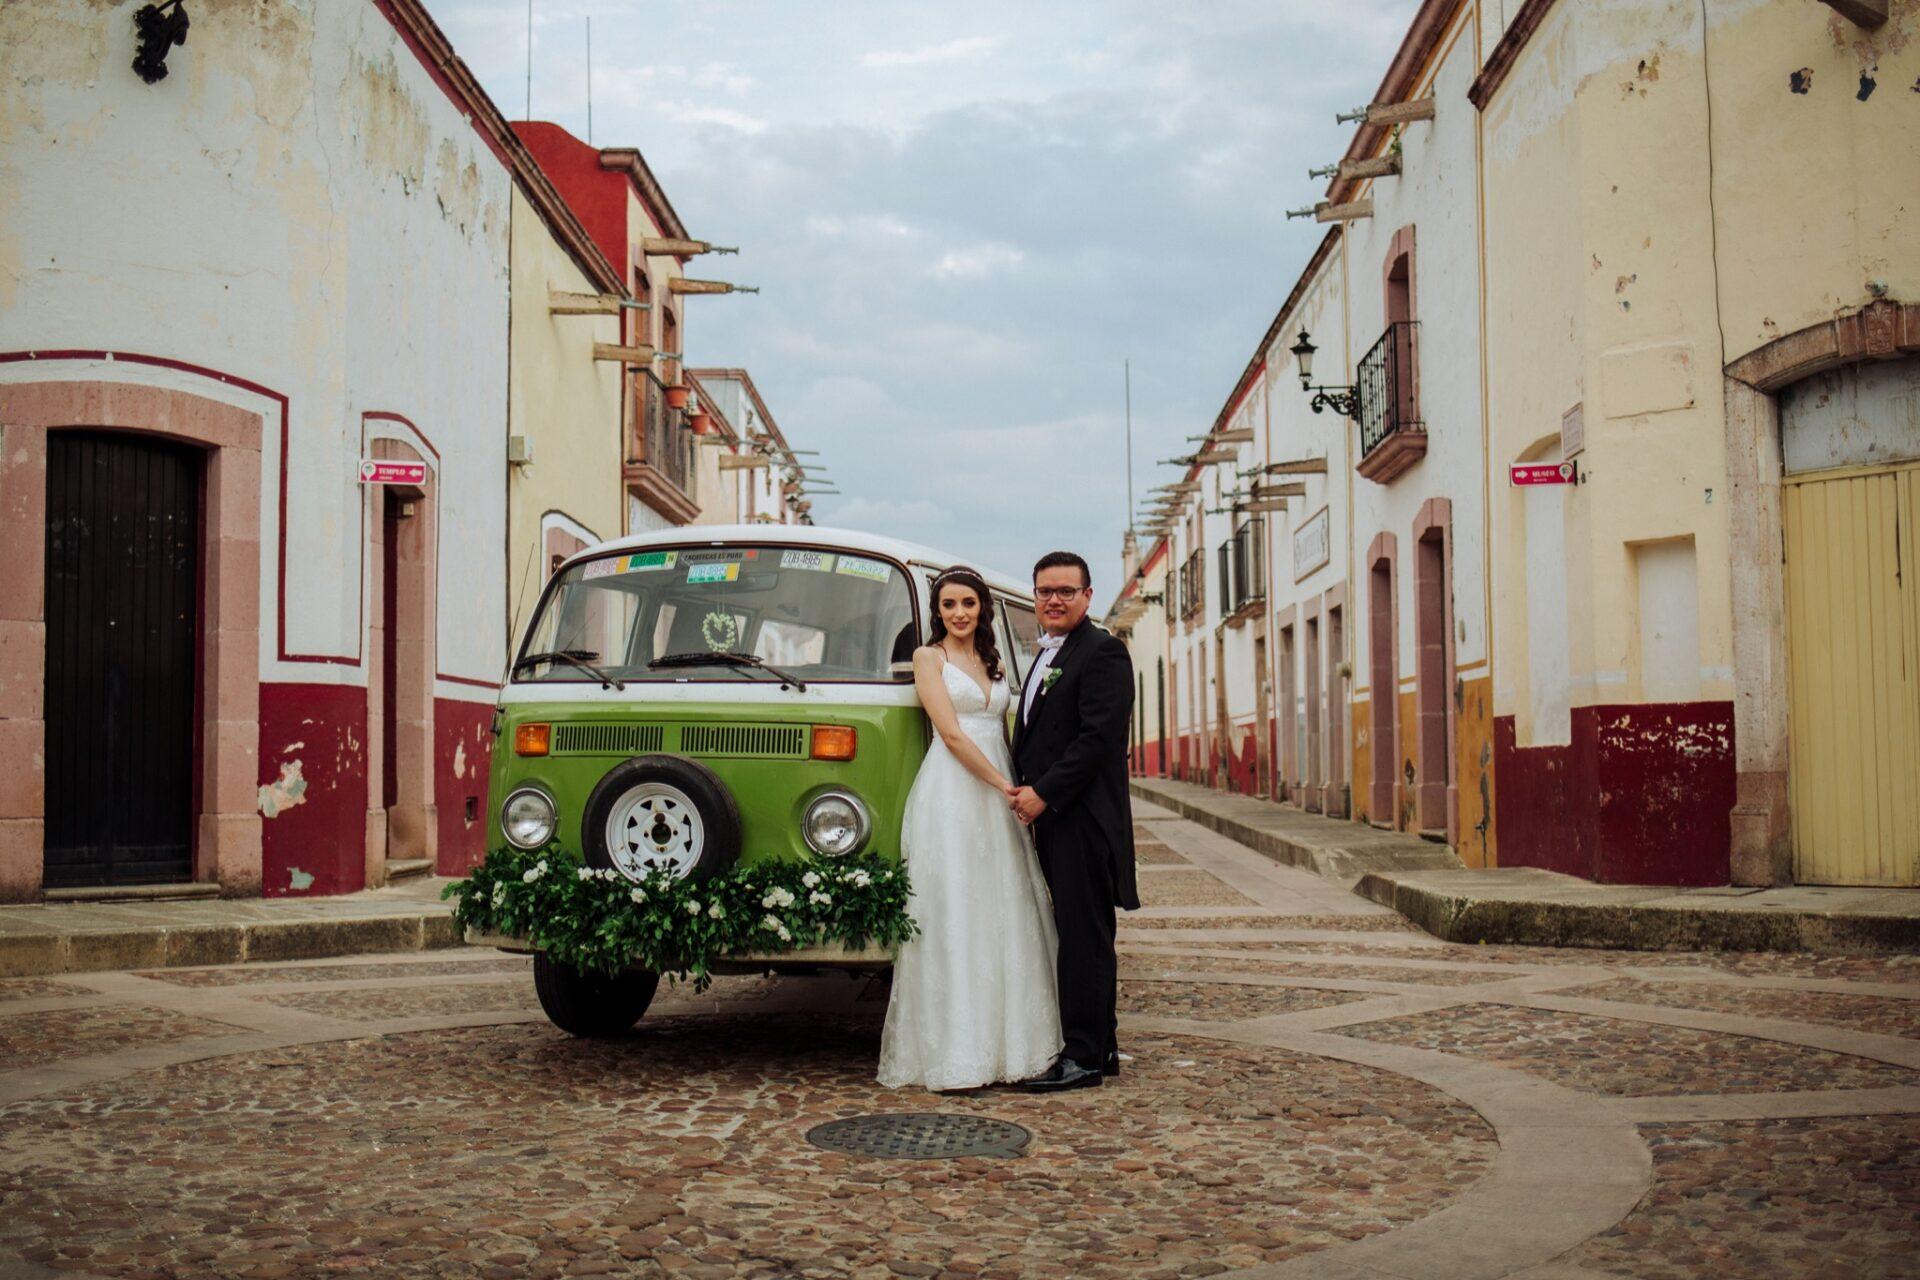 javier_noriega_fotografo_bodas_teul_zacatecas_wedding_photographer22a